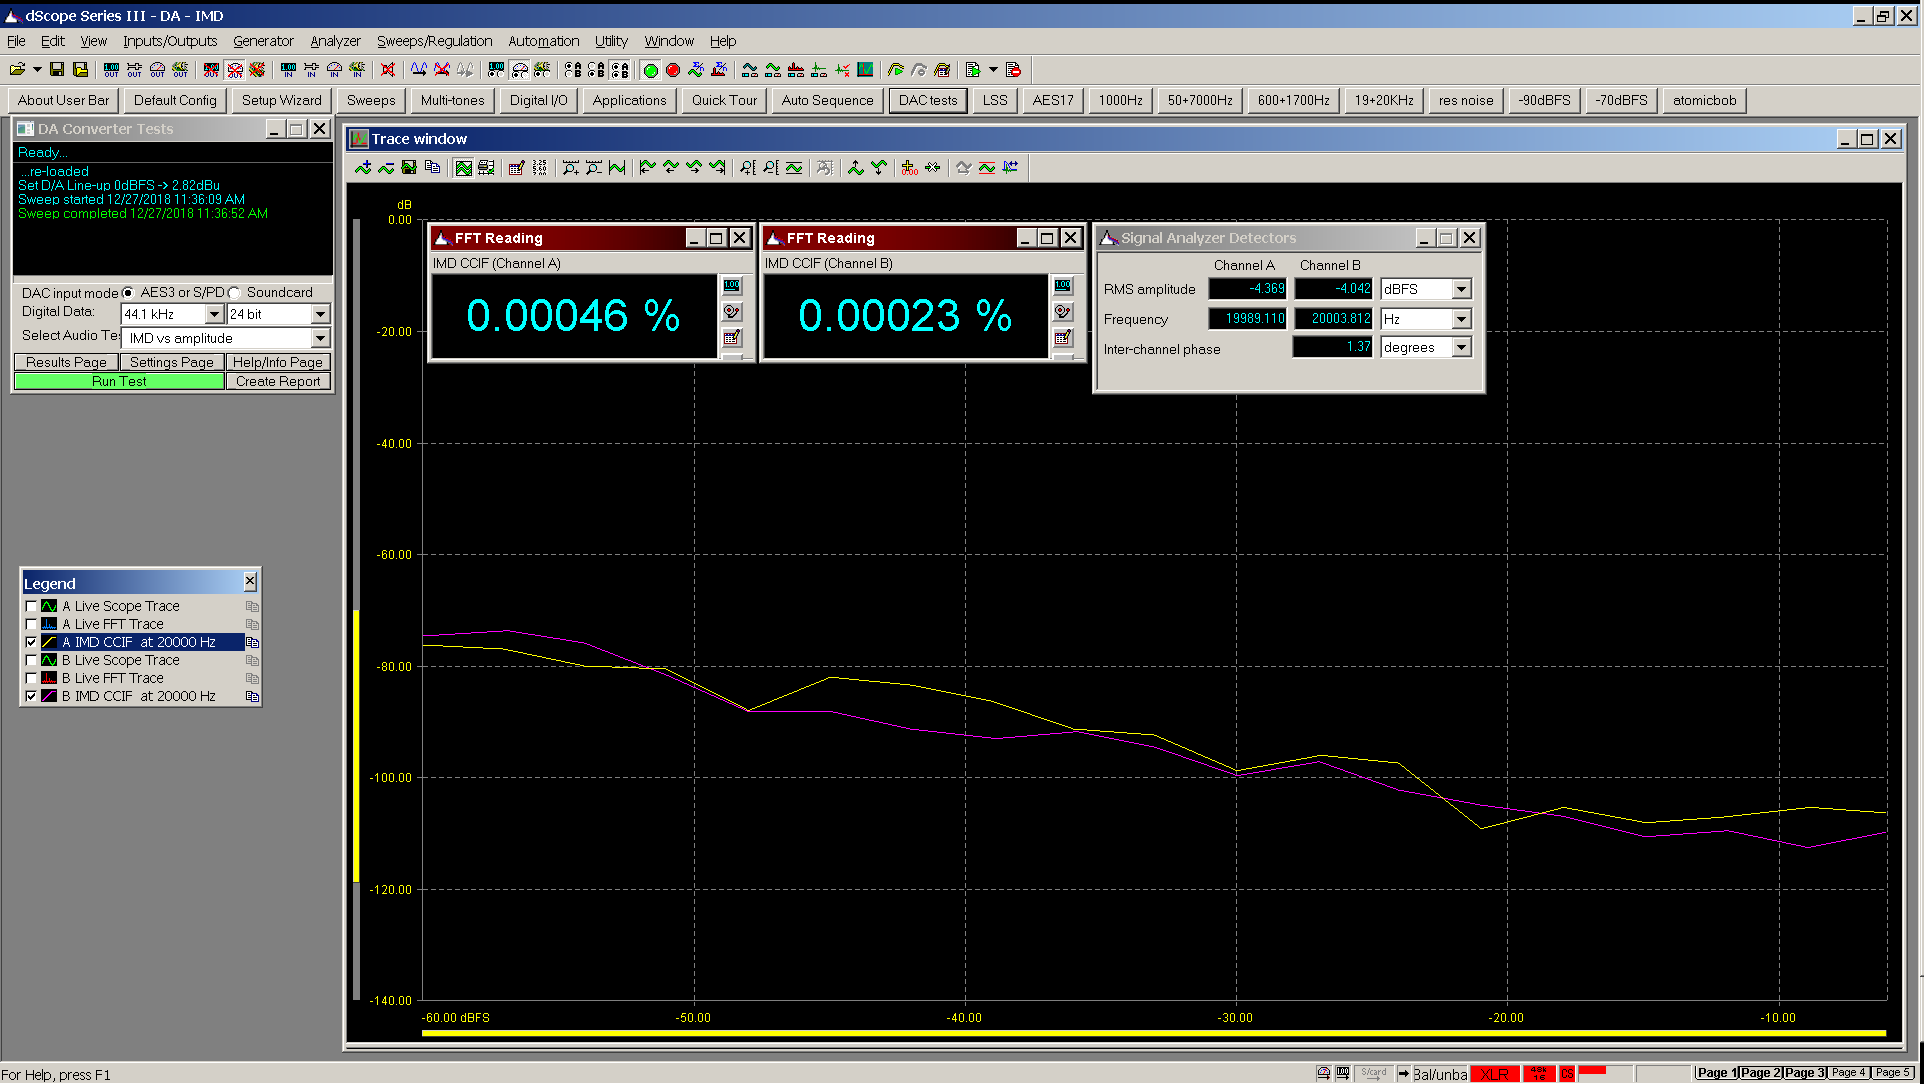 20181227-05 convert2 Bal IMD vs amplitude - AES.PNG